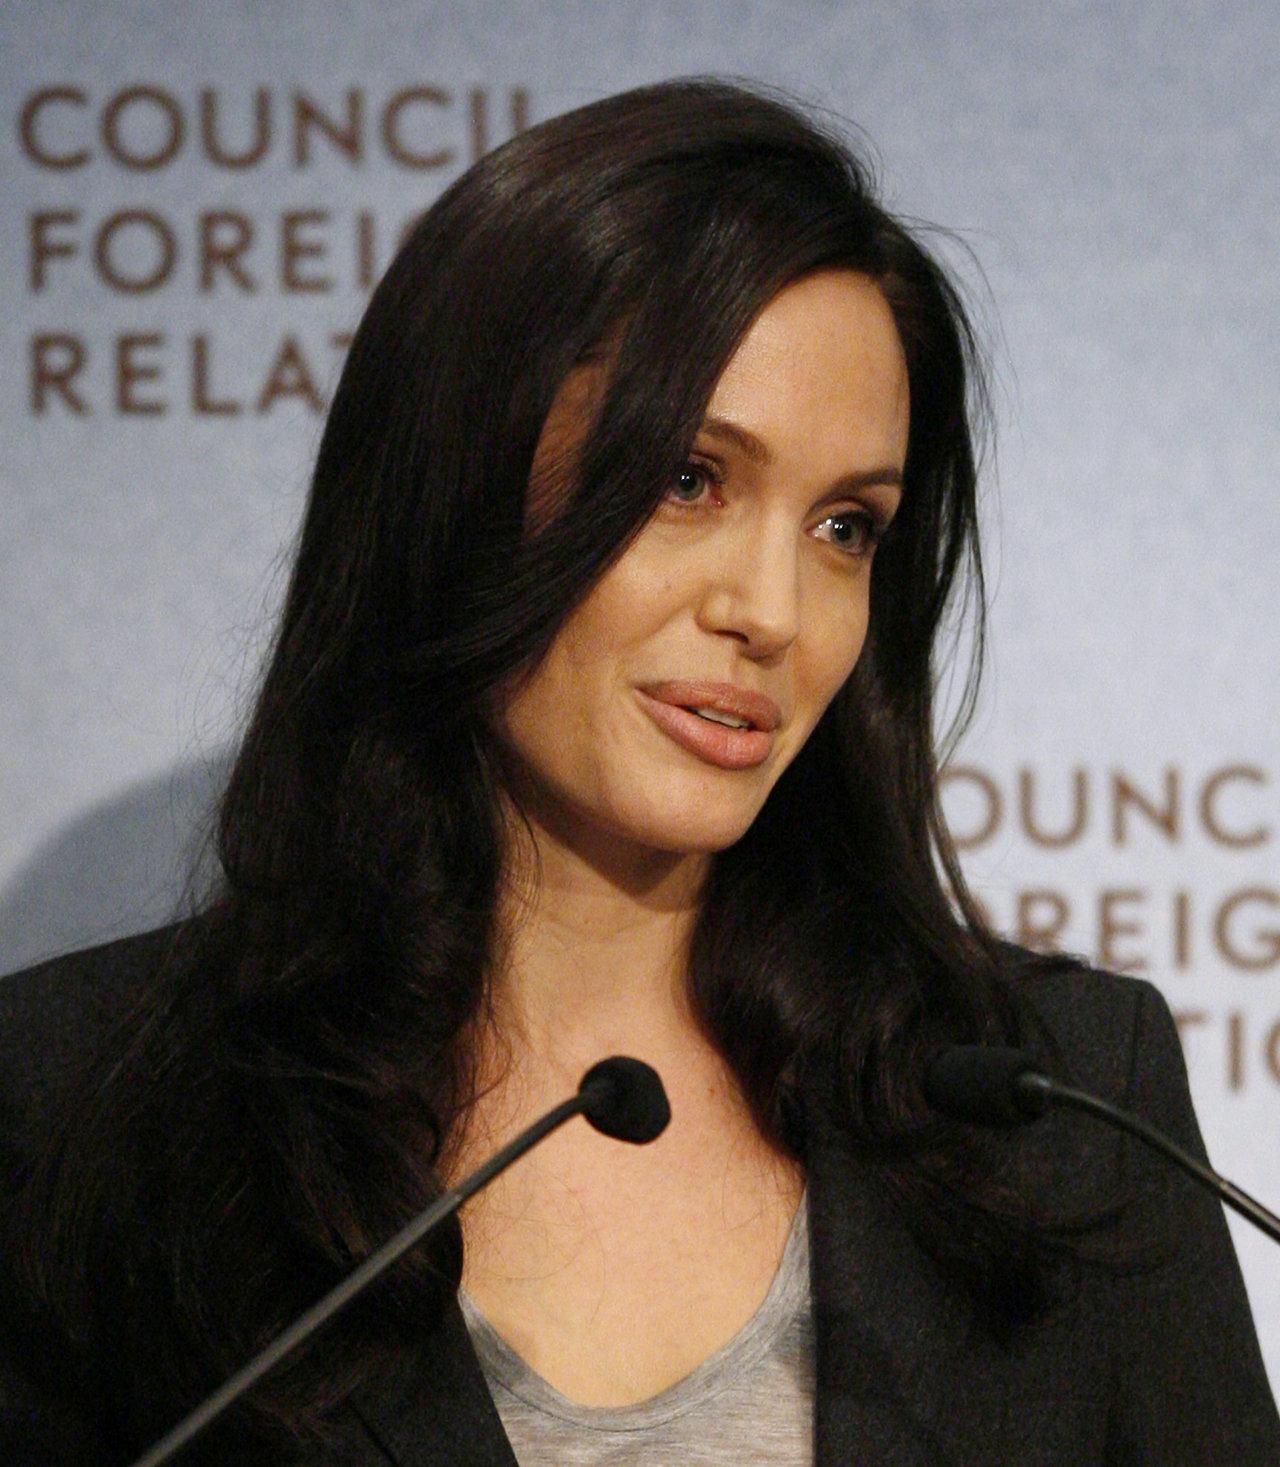 Angelina Jolie leaked wallpapers